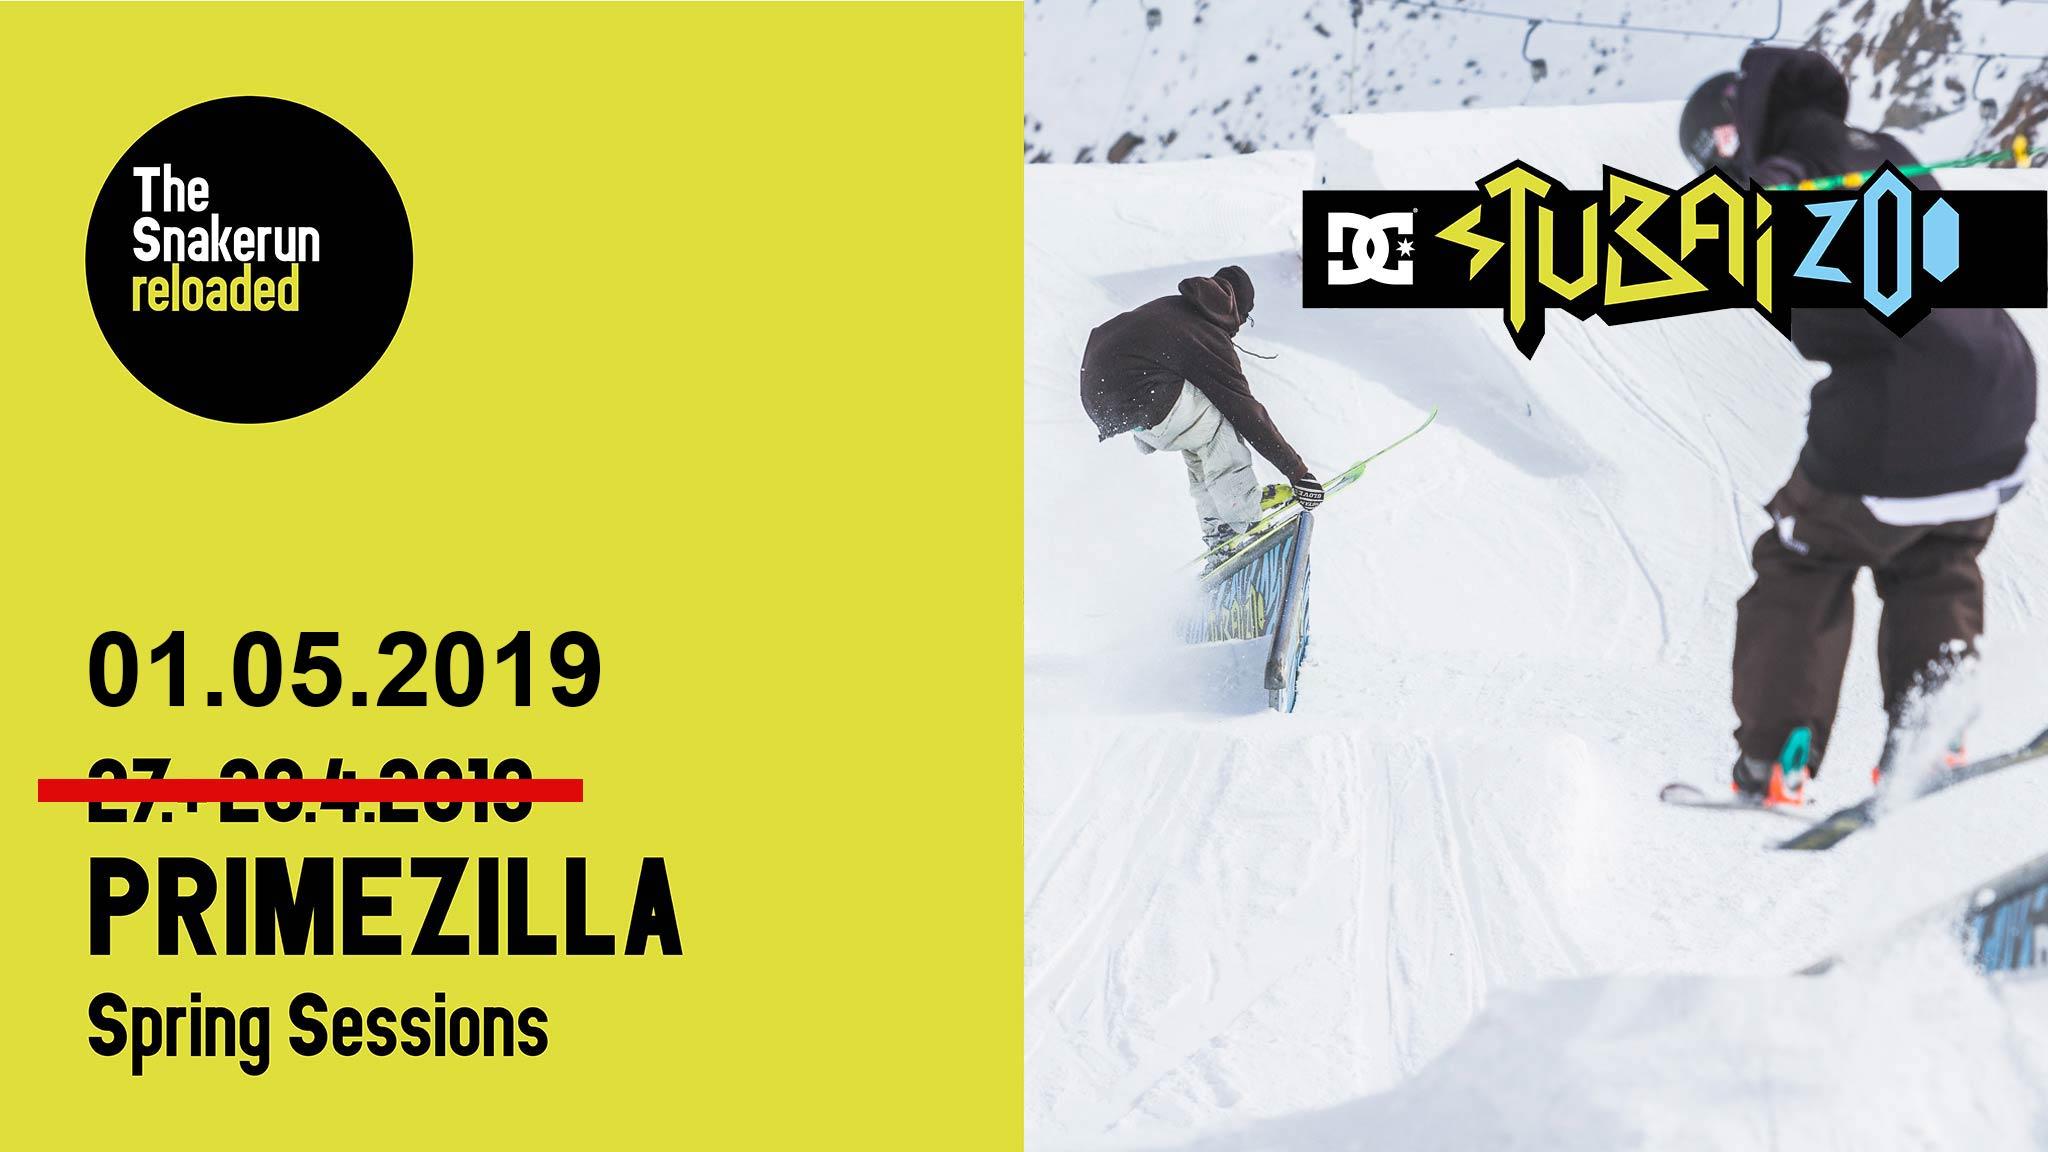 Primezilla Cashout Spring Session 2019 im Stubai Zoo - UPDATE